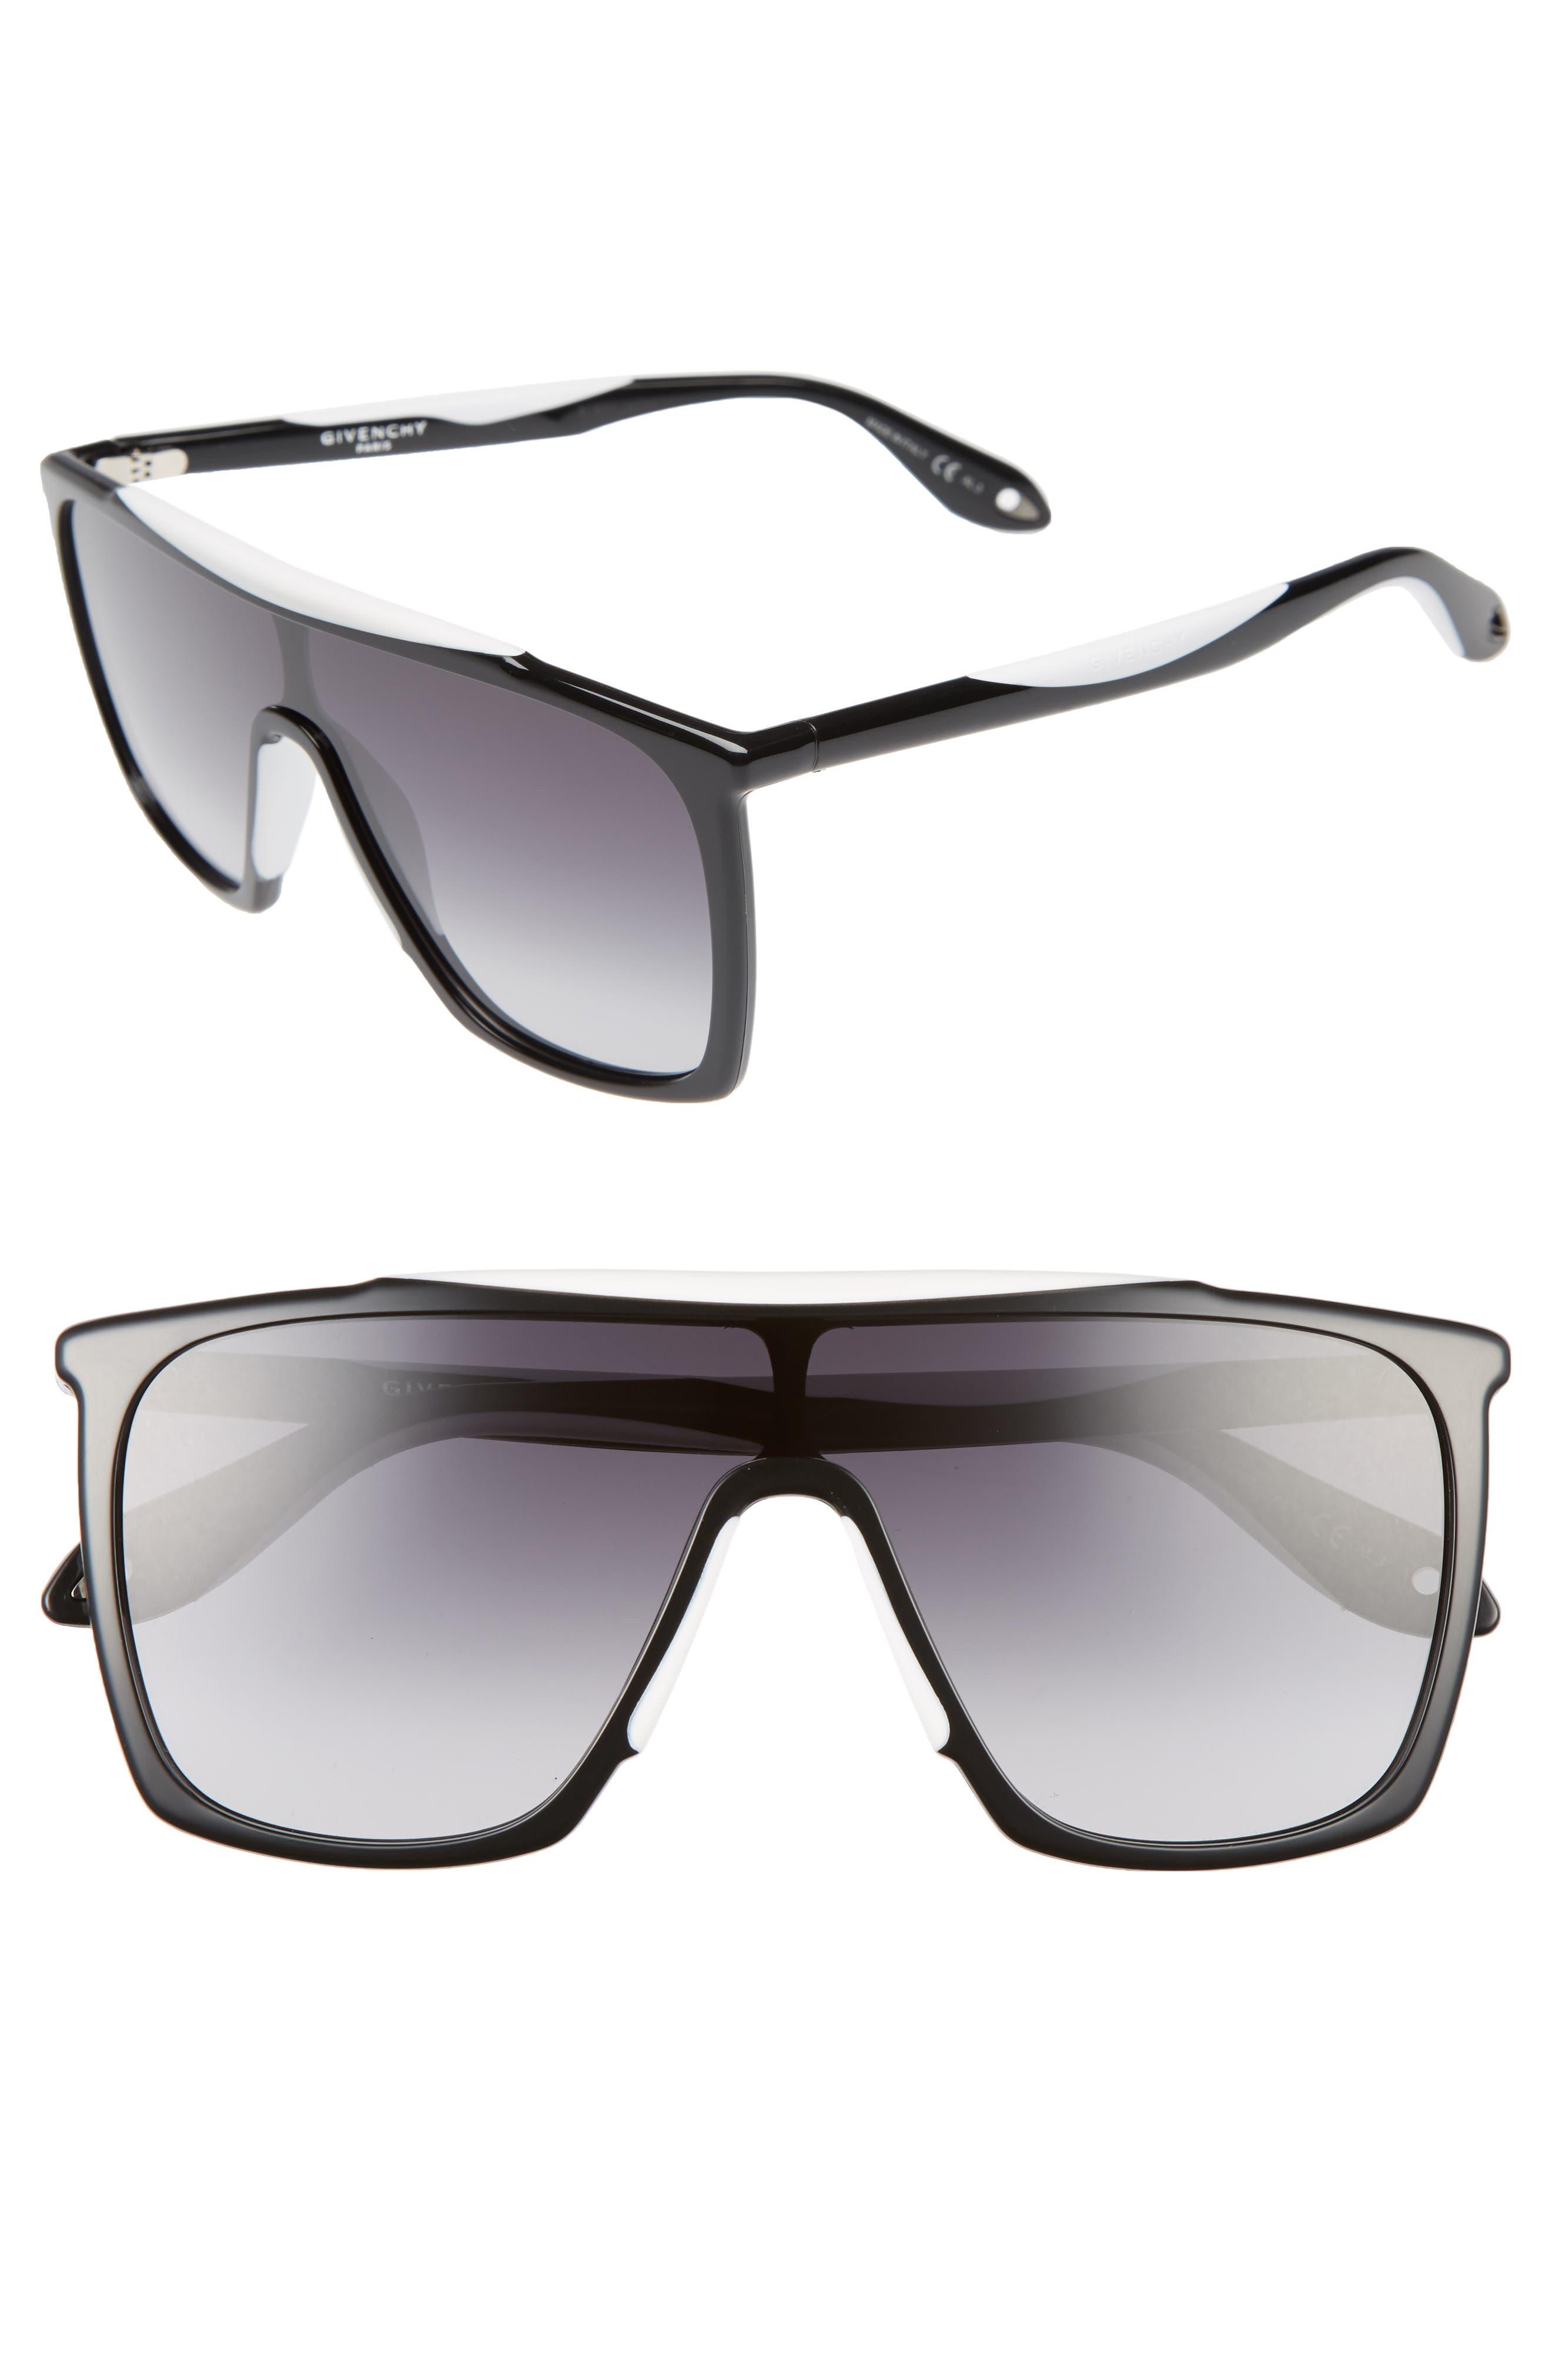 53mm Mask Sunglasses,                         Main,                         color, Black/ White